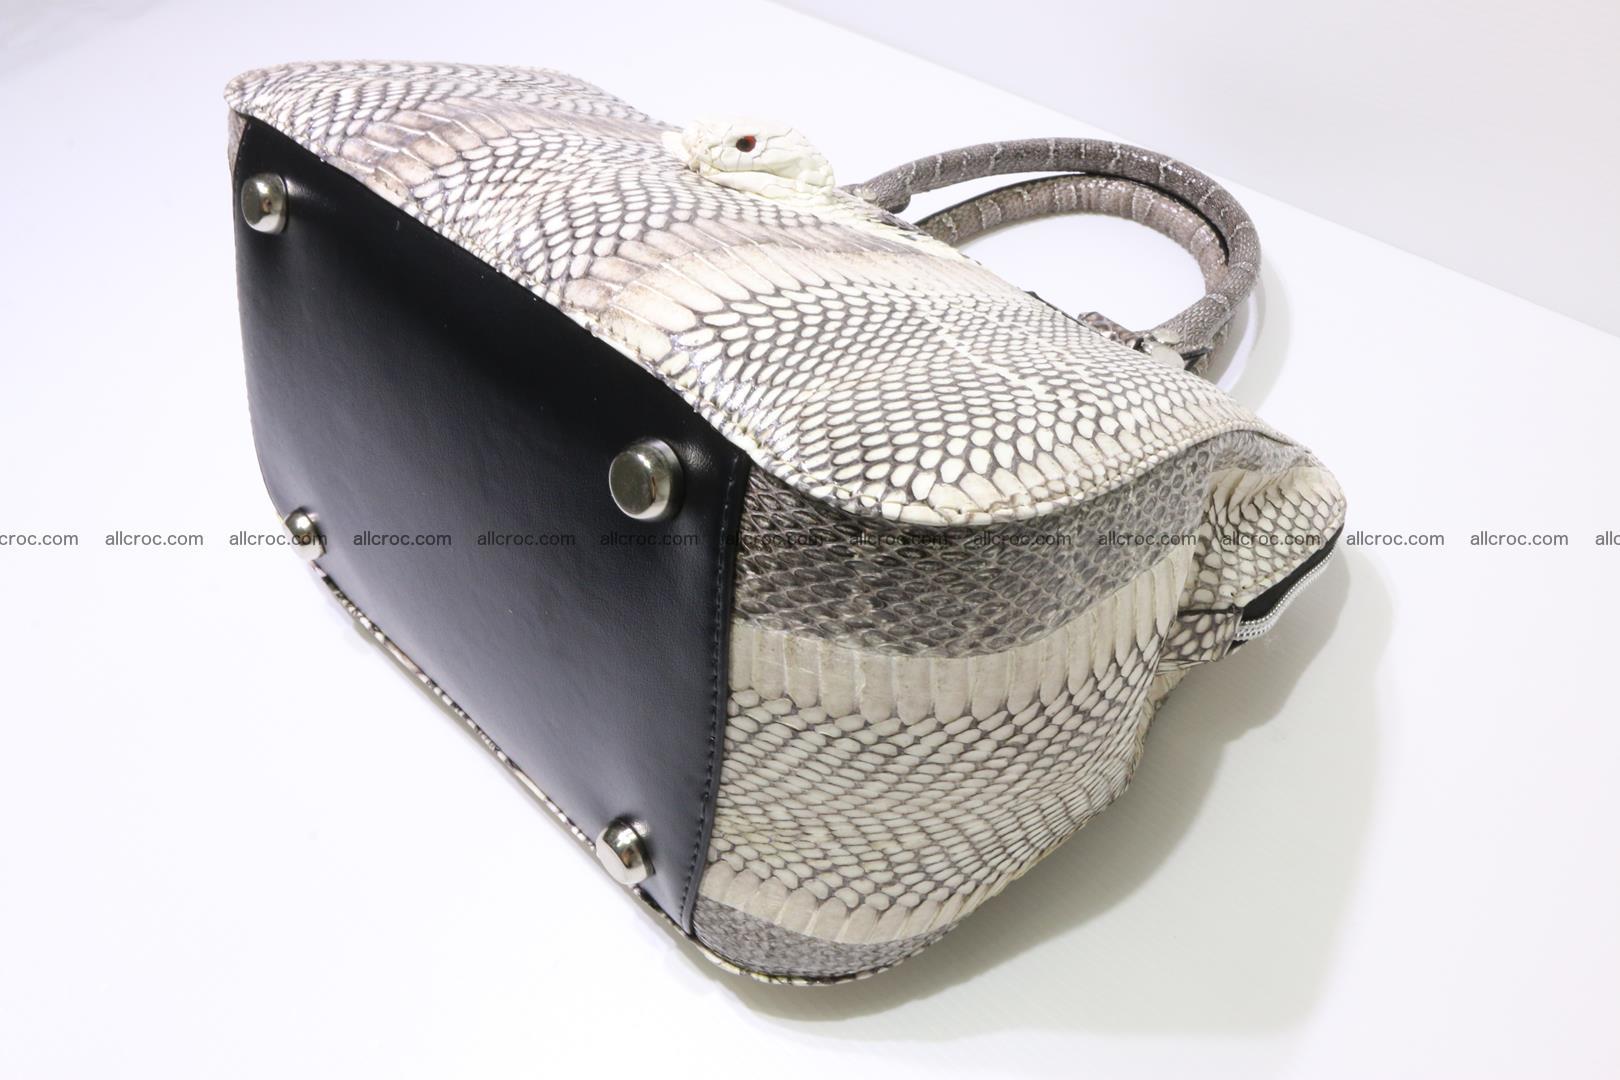 Cobra skin ladies handbag with head of cobra 193 Foto 11